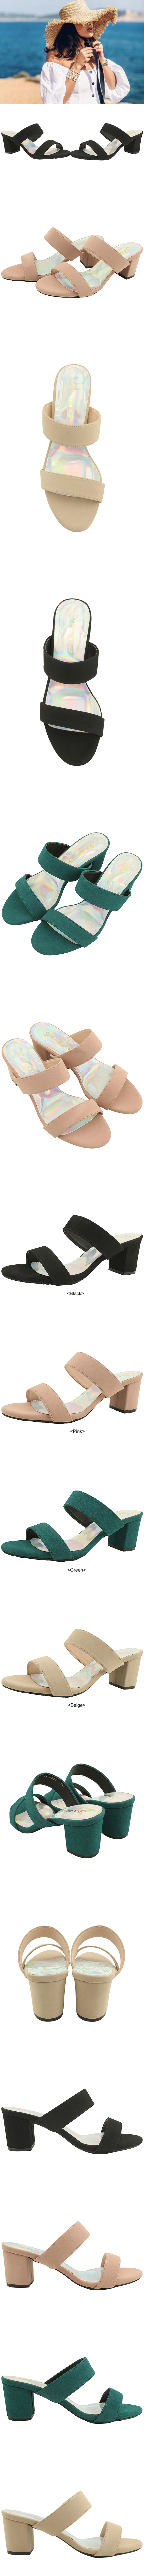 Basic Strap Mule Middle Heel Slippers Beige